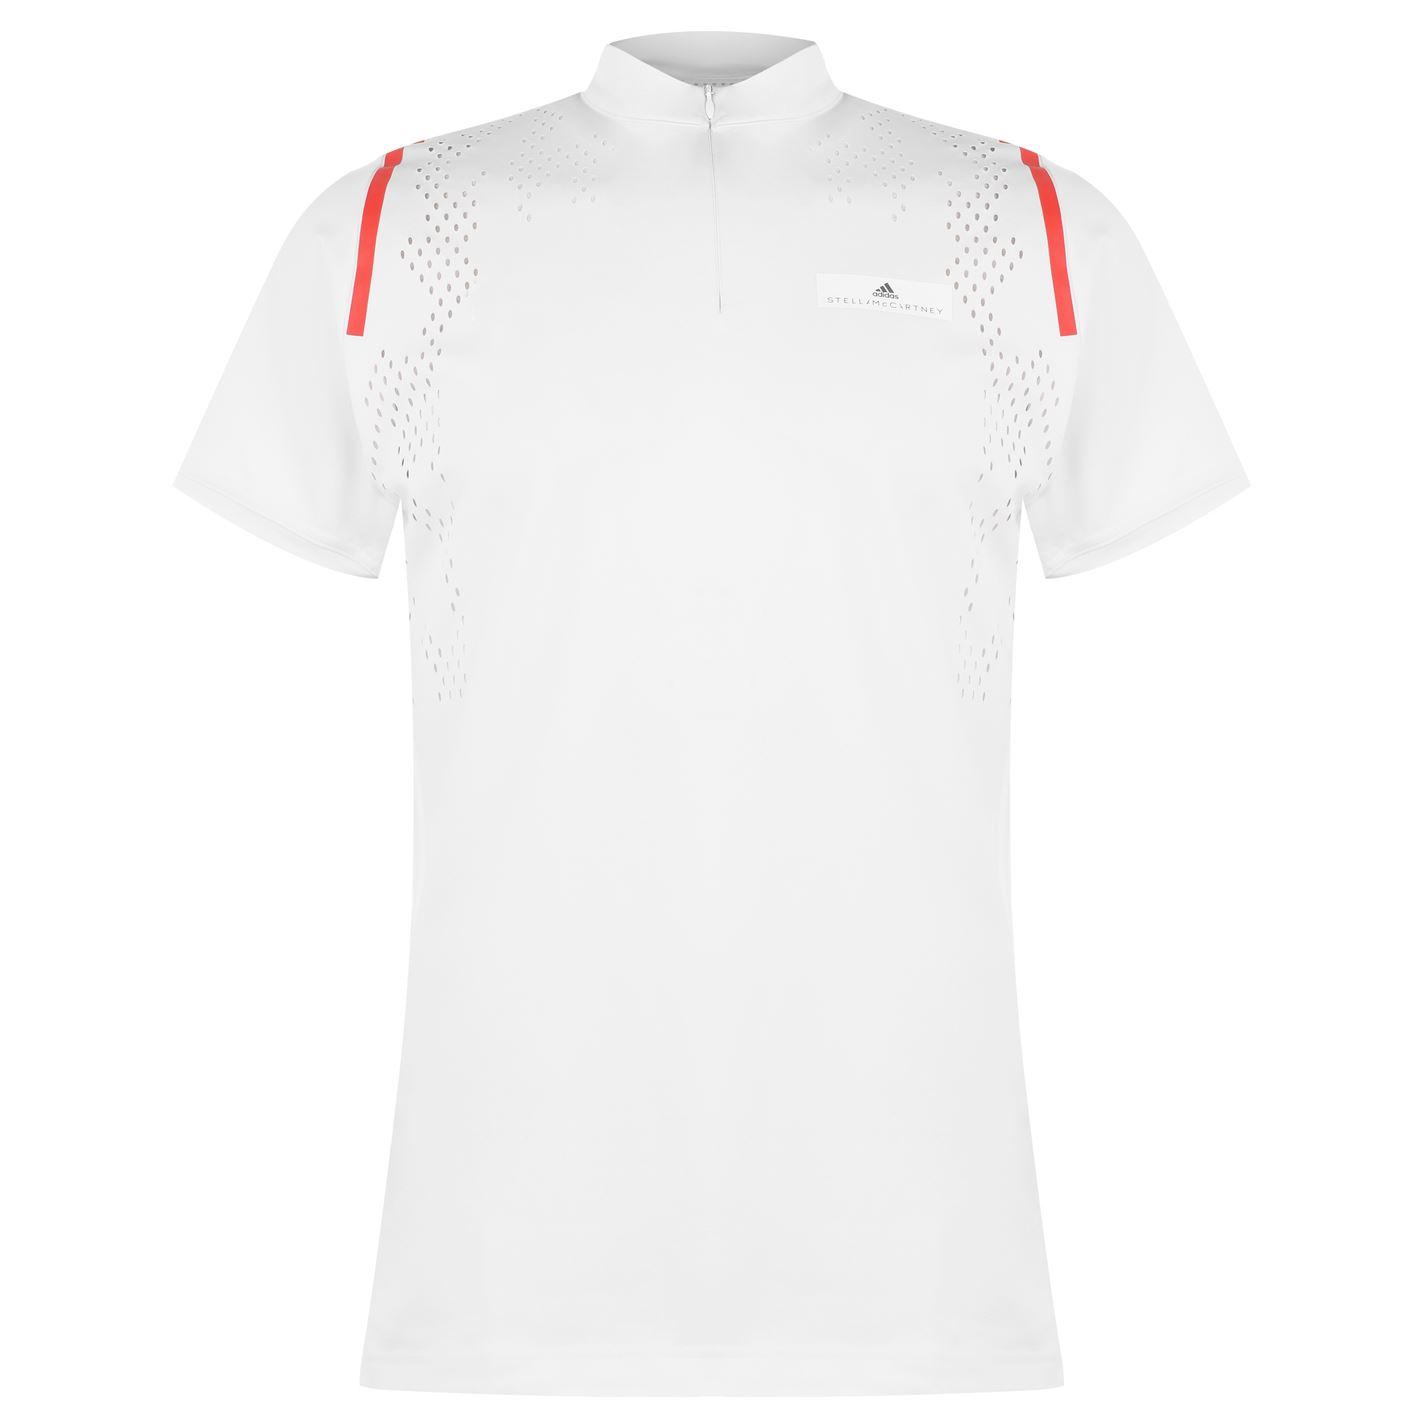 Adidas Stella McCartney Court Zip T Shirt Mens